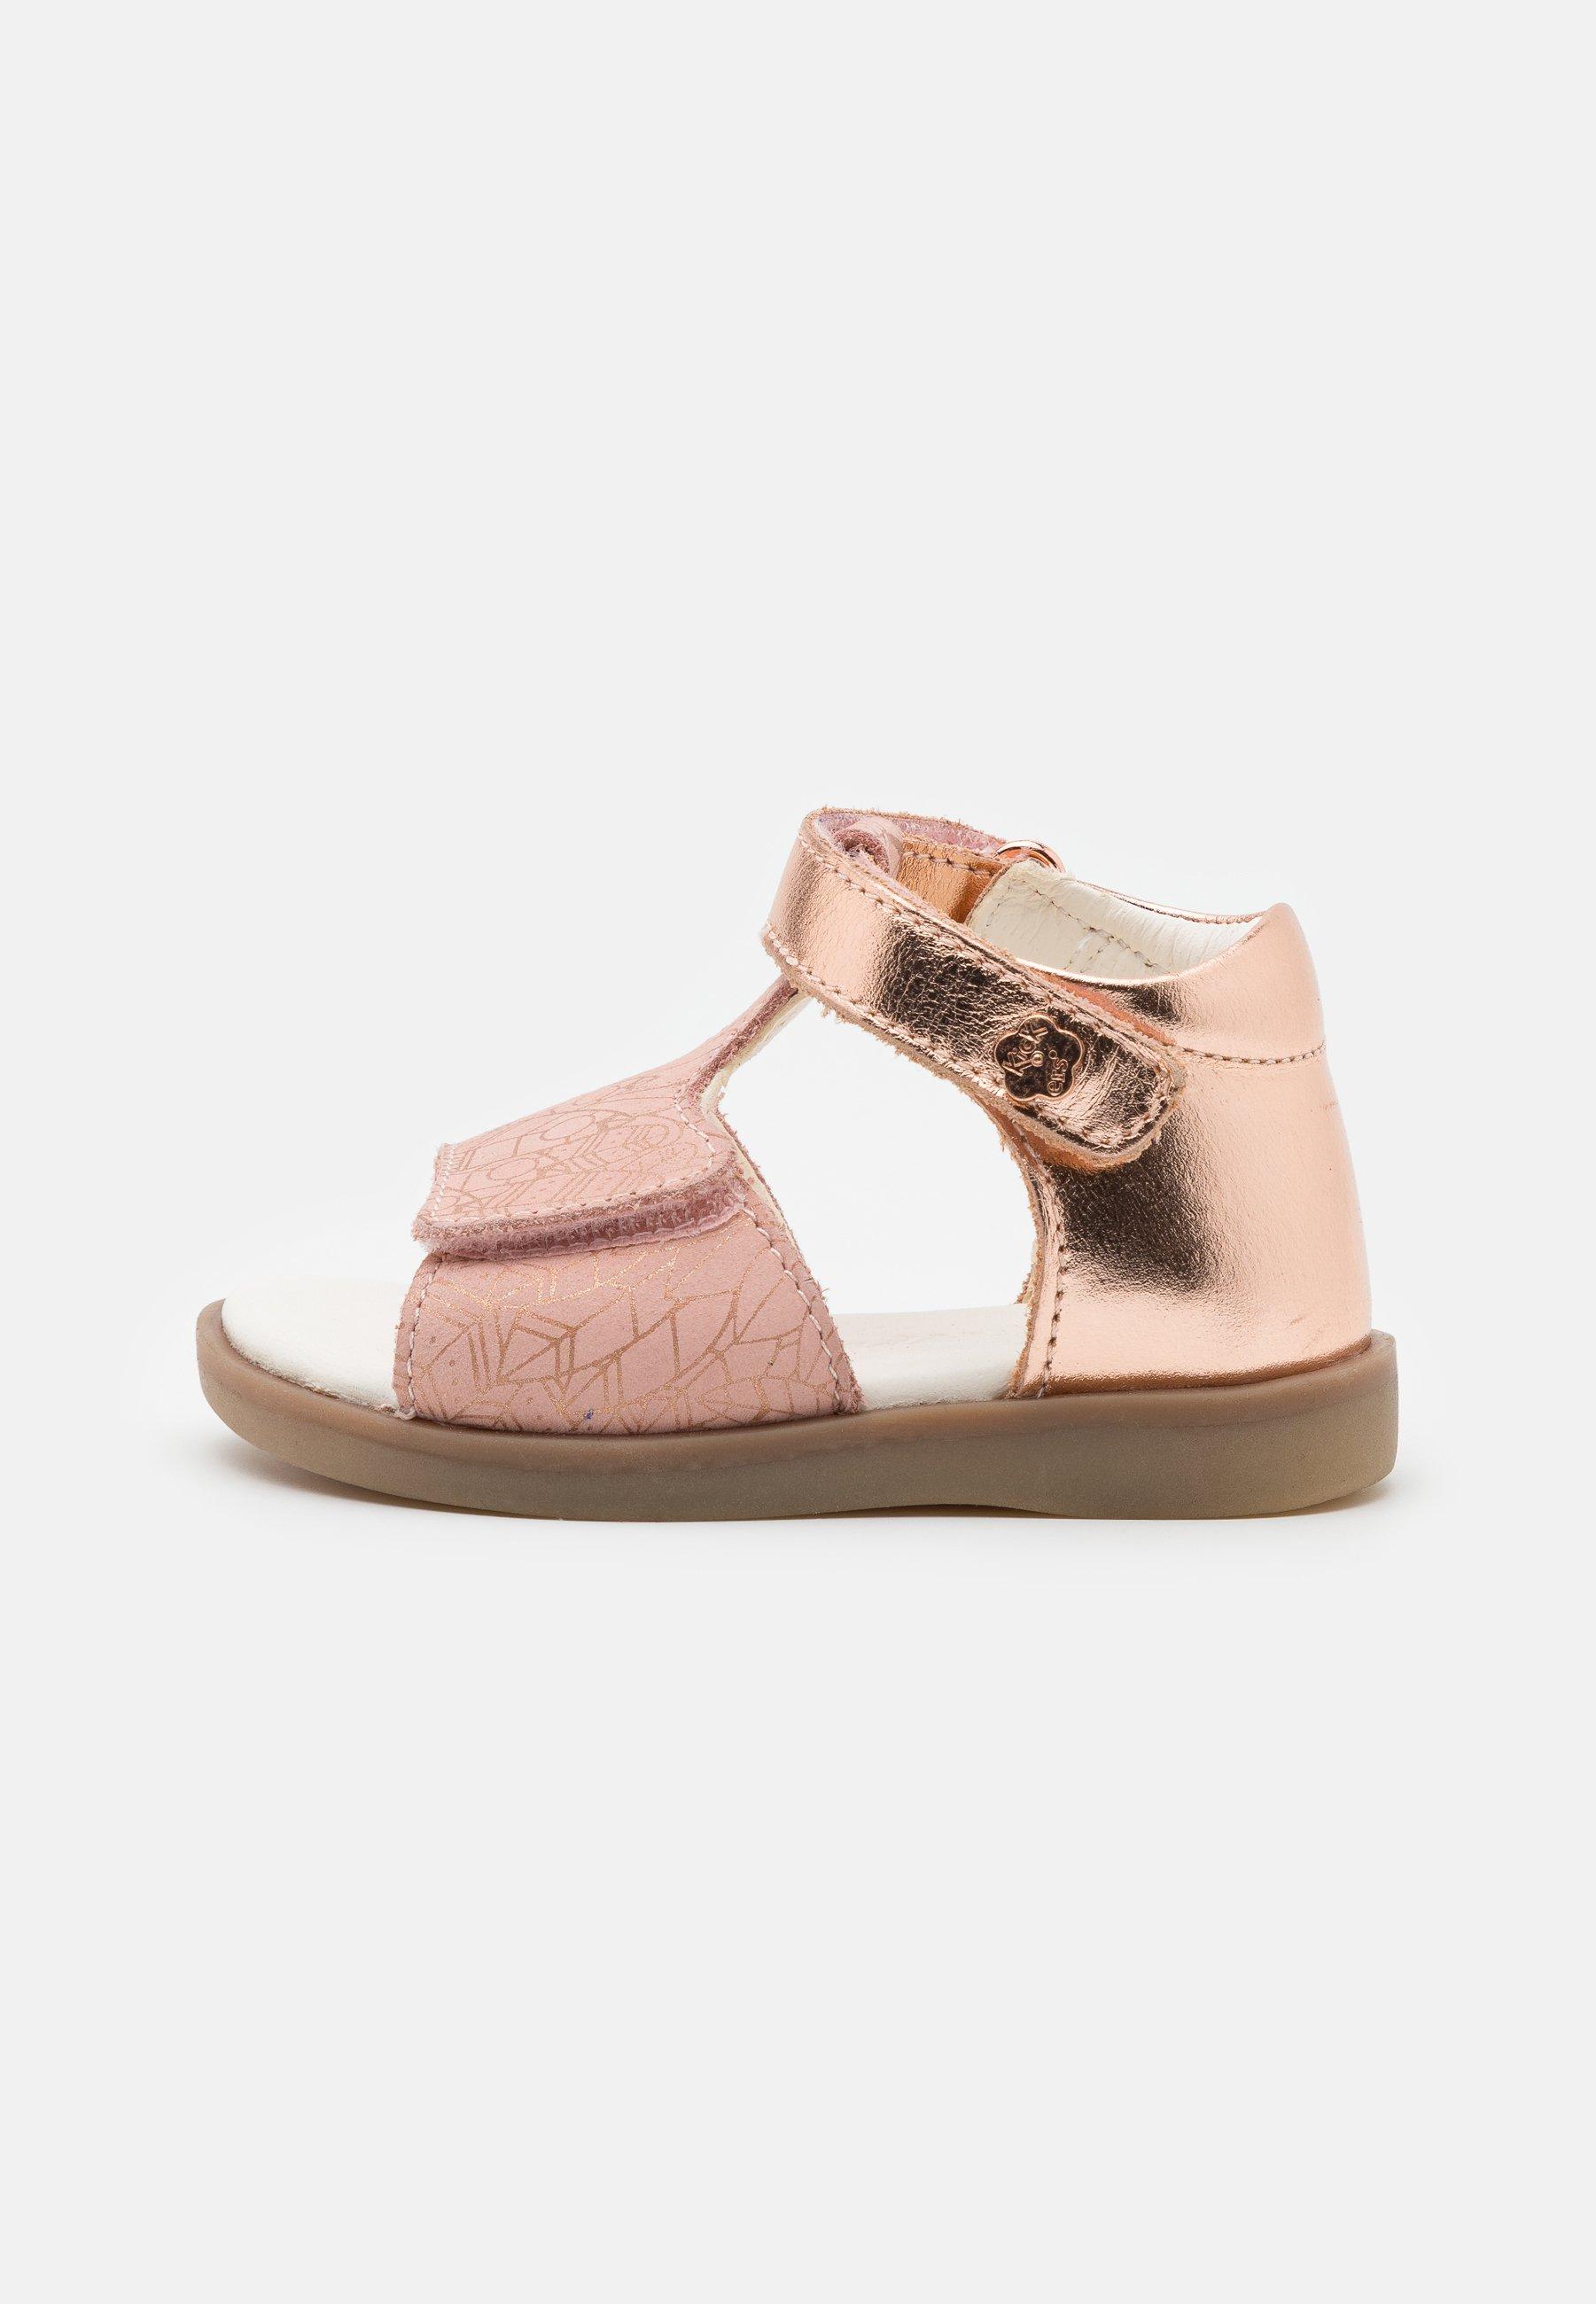 Kids GIUSTICIA - Sandals - rose